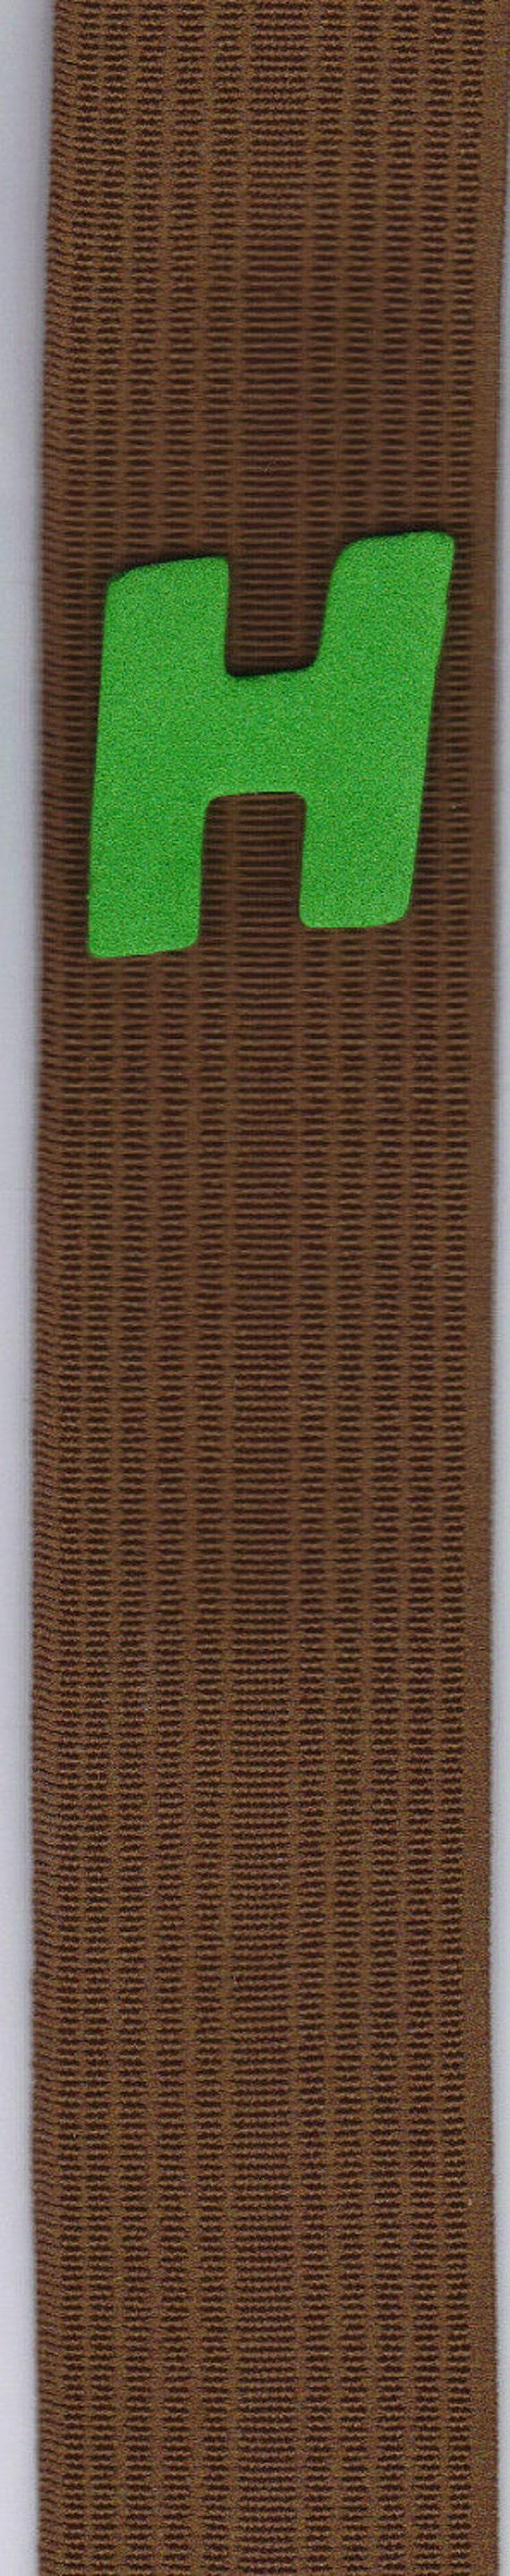 "2 yards of 1"" inch Tan Suspender ELASTIC  Ribbon Non Roll"